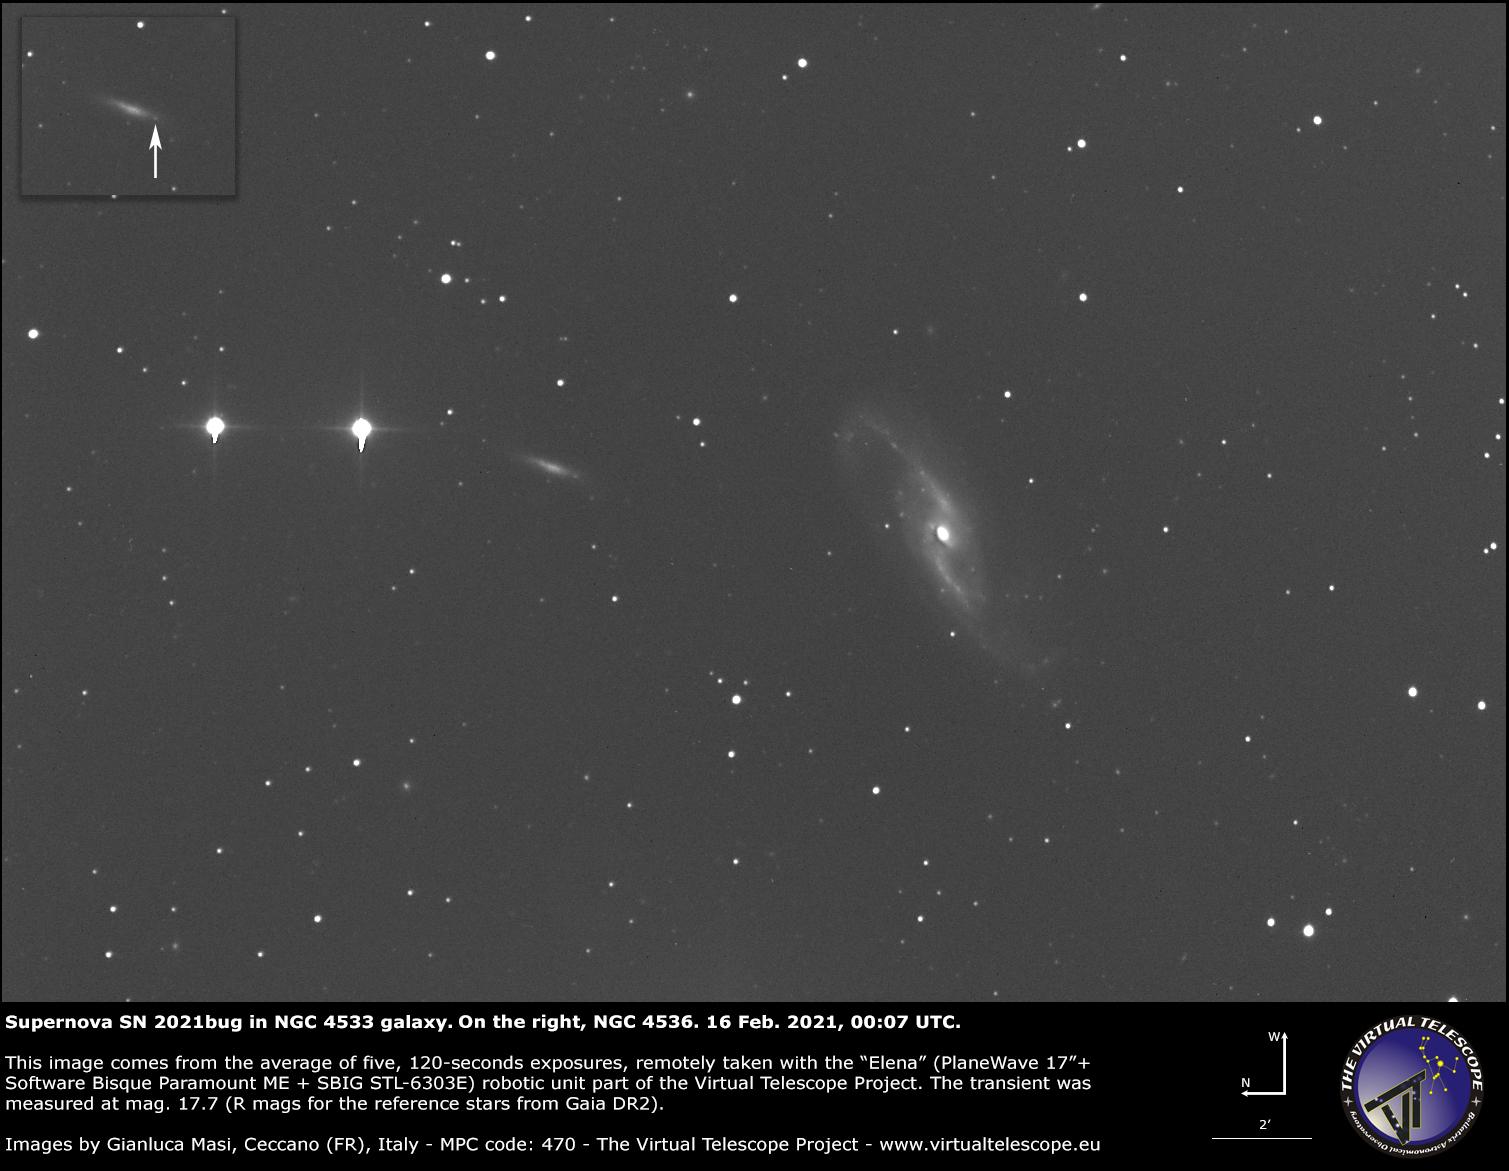 Supernova SN 2021bug in NGC 4533 galaxy: 16 Feb. 2021.